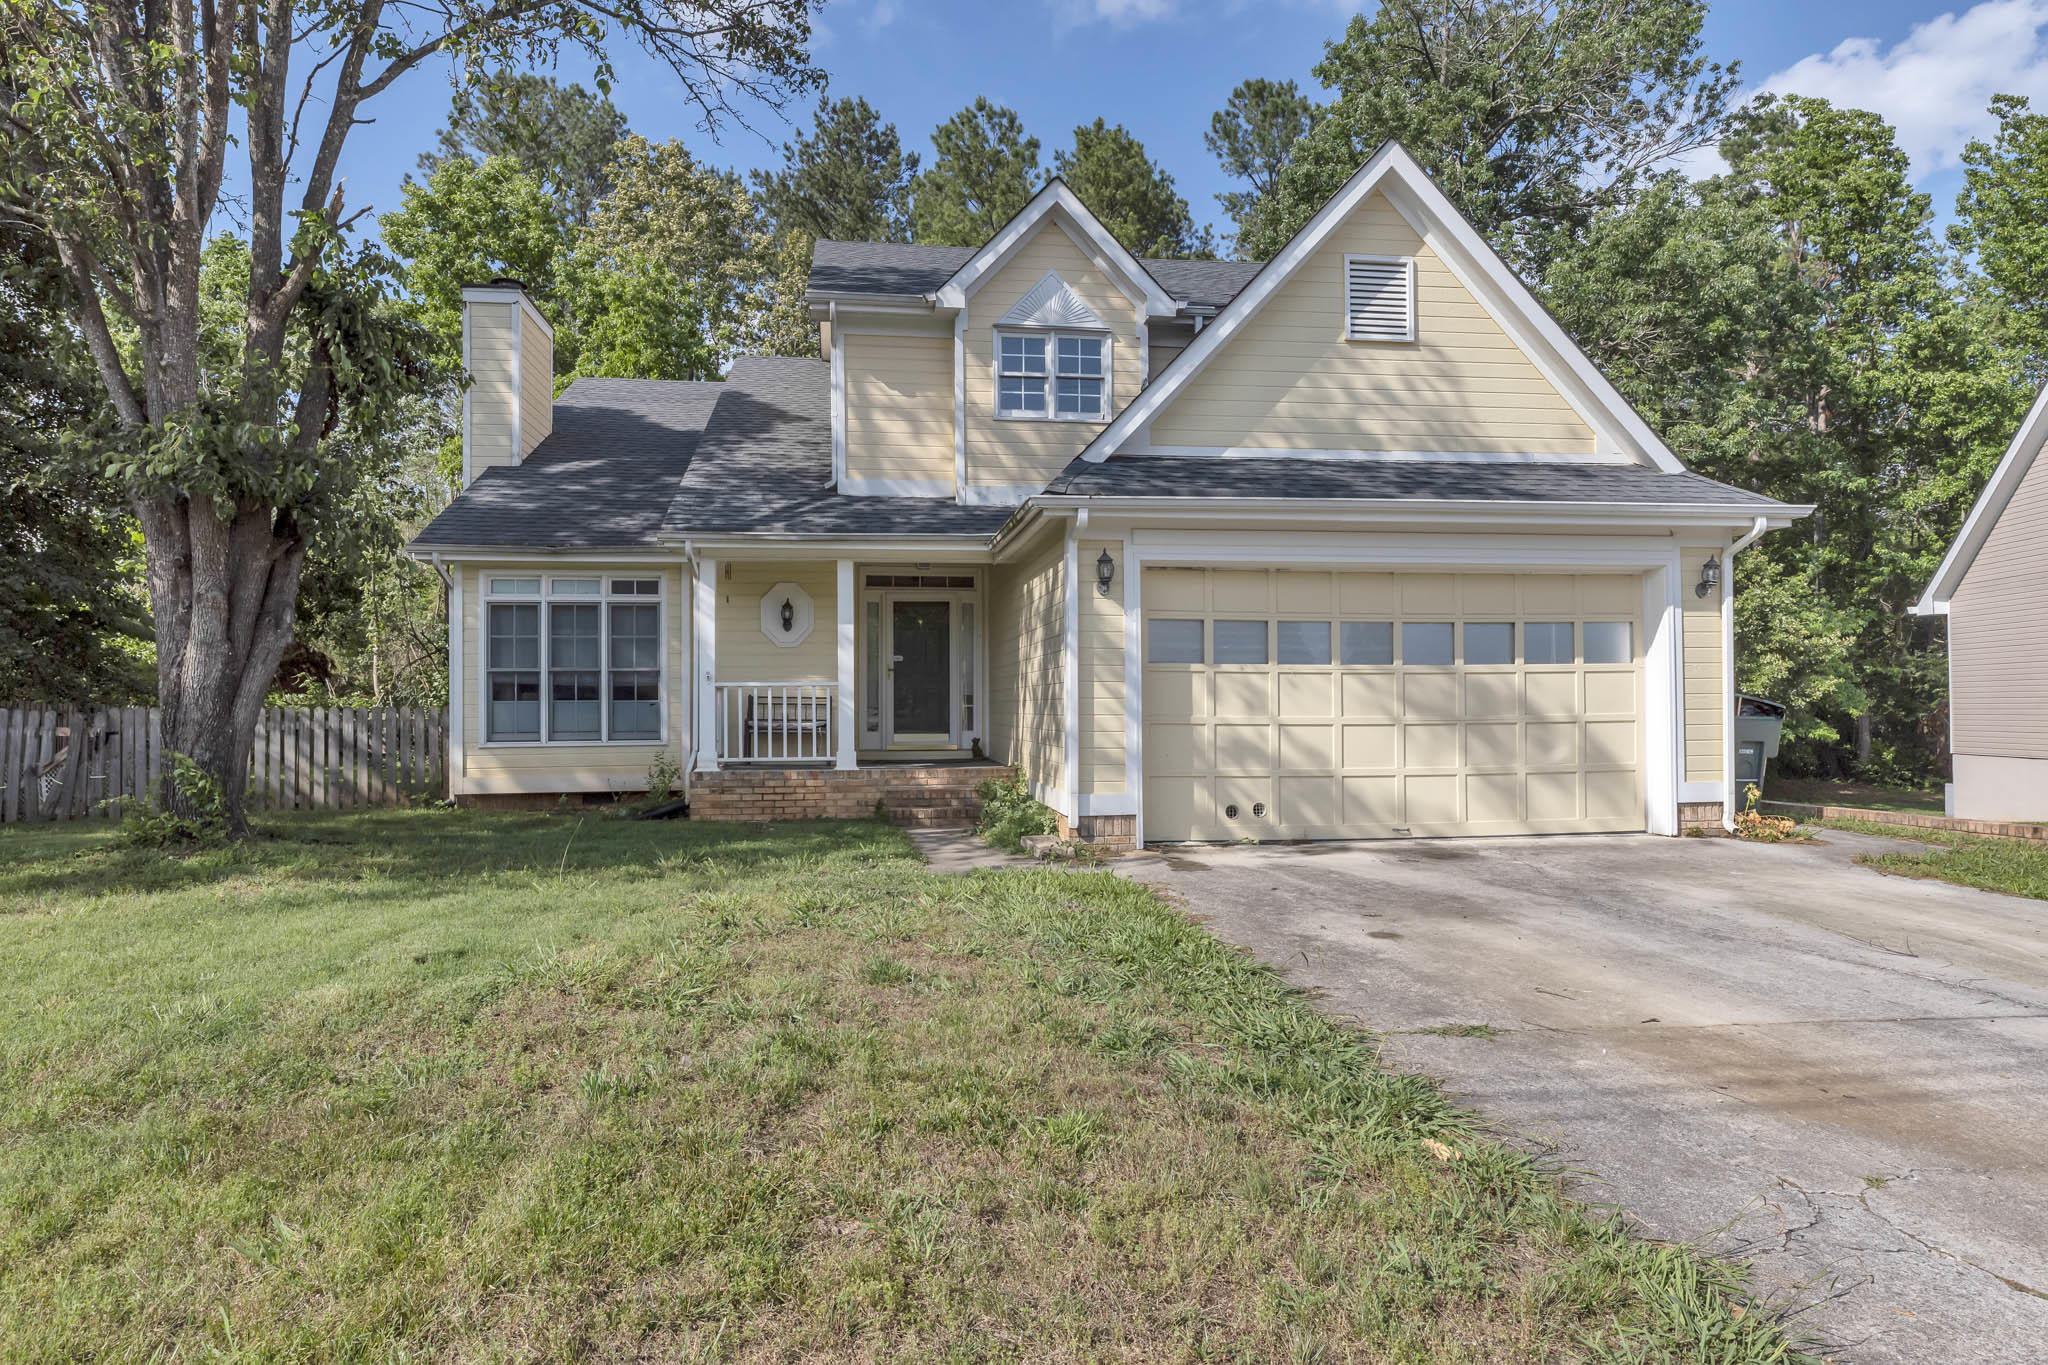 7953 Hamilton Mill Dr, Chattanooga, TN 37421